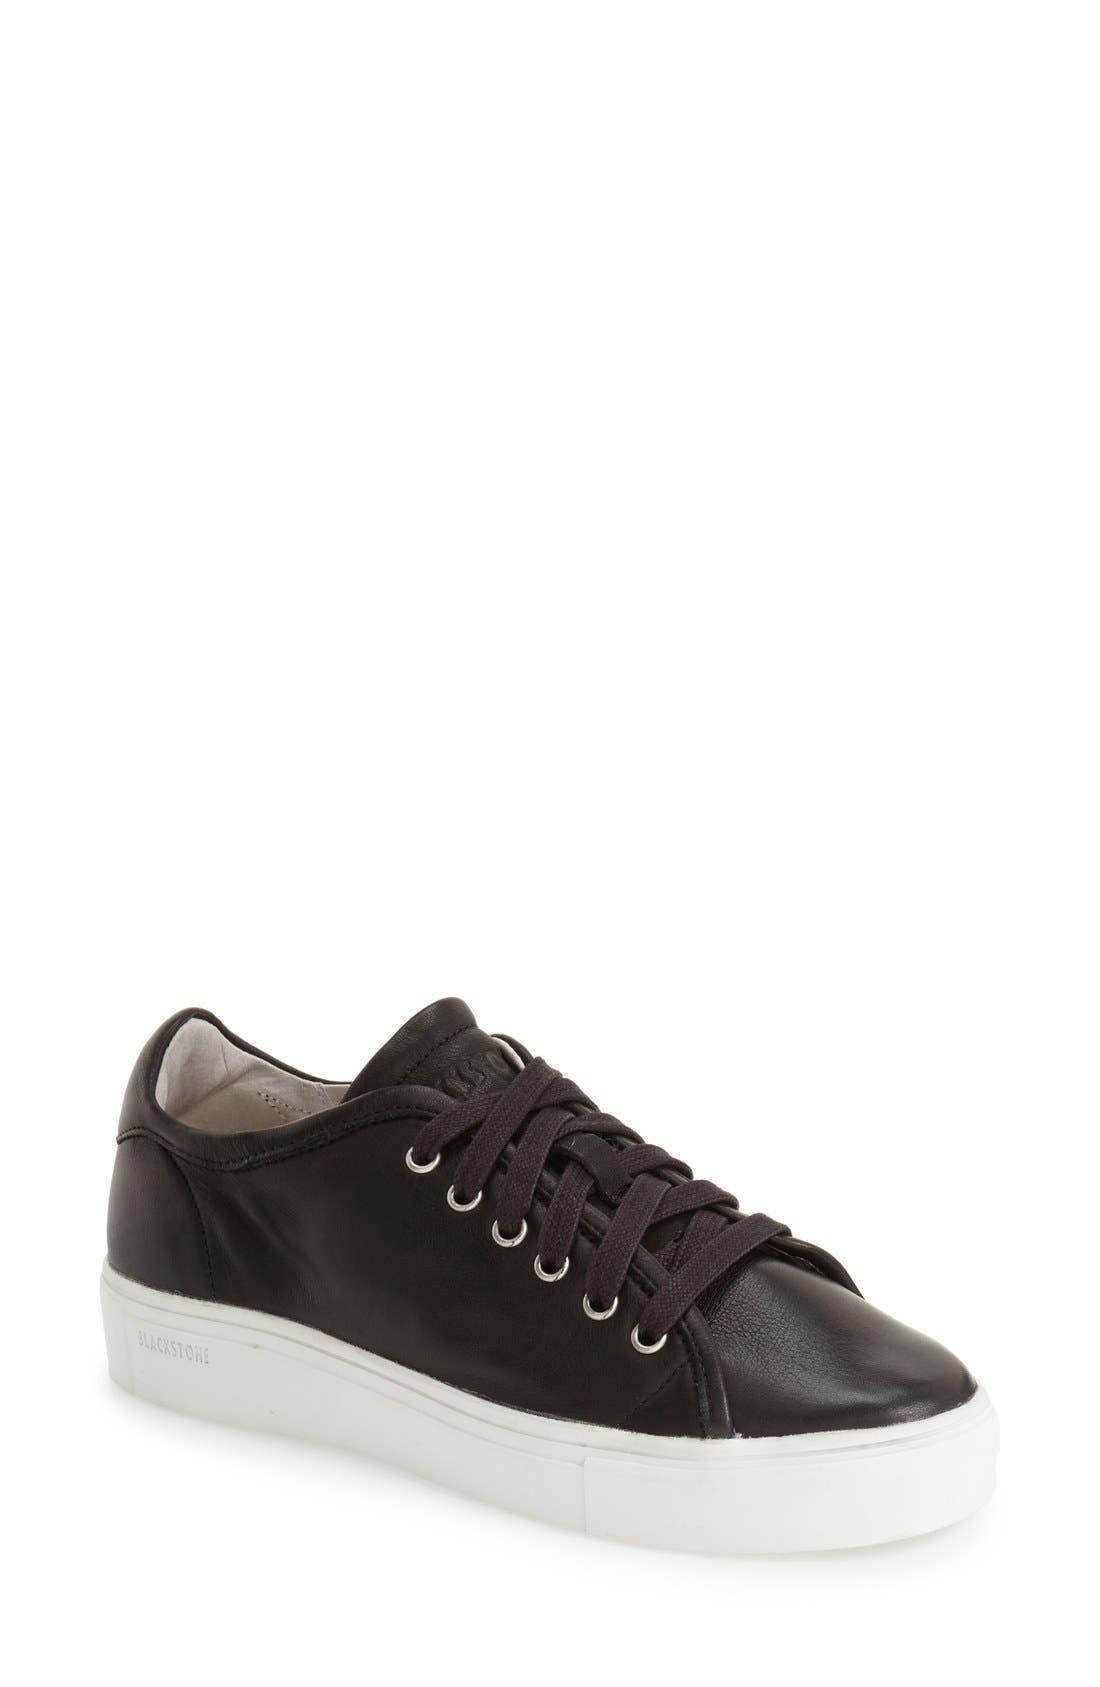 Main Image - Blackstone 'LL64' Sneaker (Women)